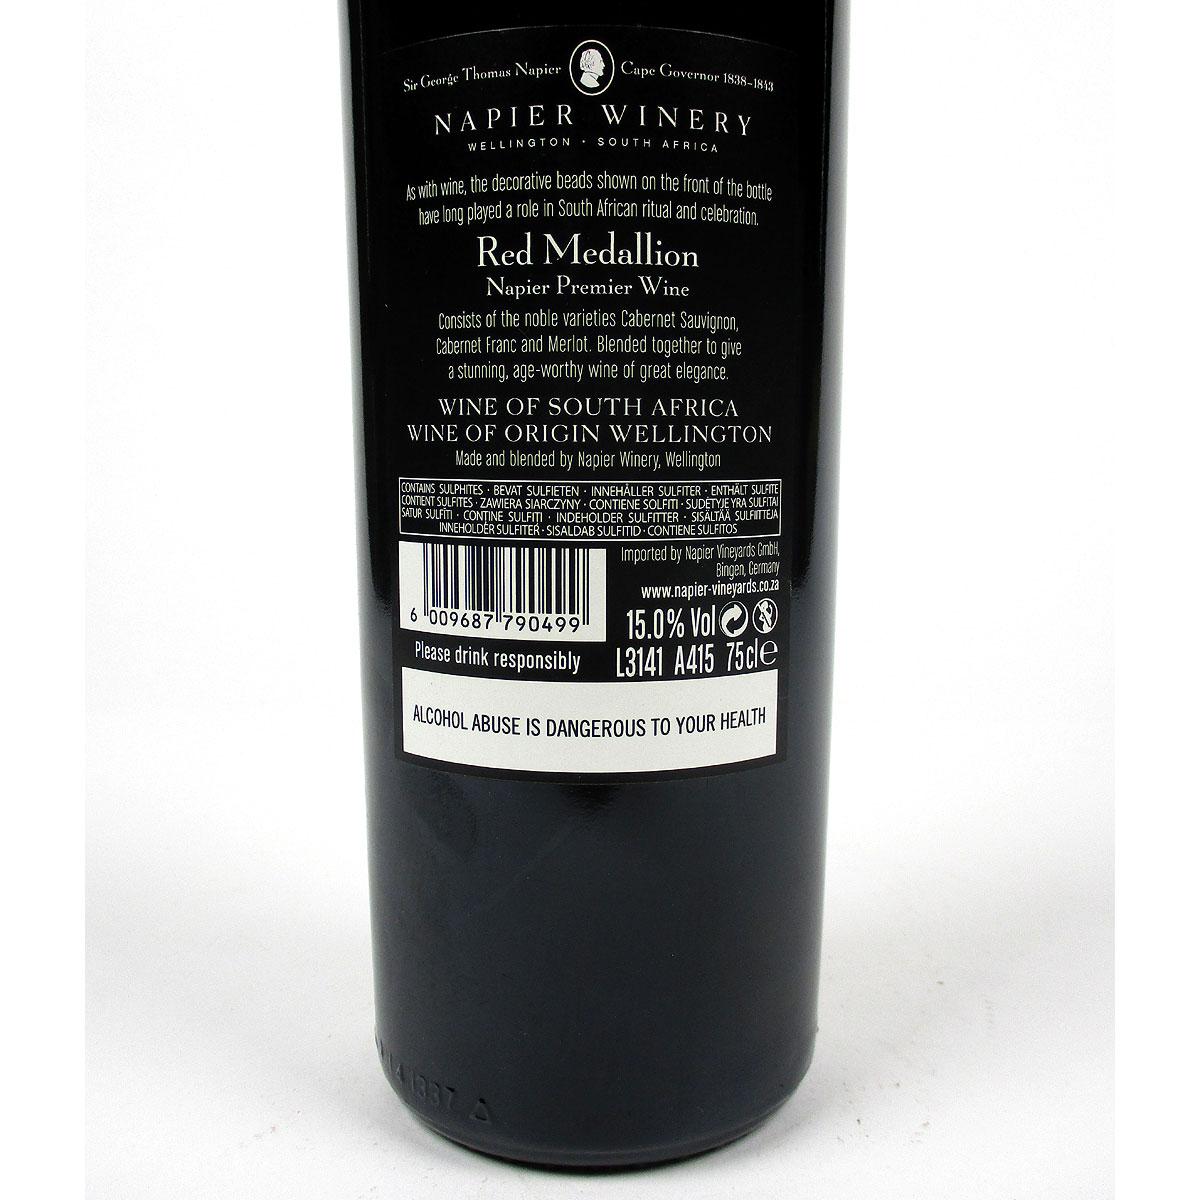 Napier Winery: 'Red Medallion' 2014 - Bottle Rear Label